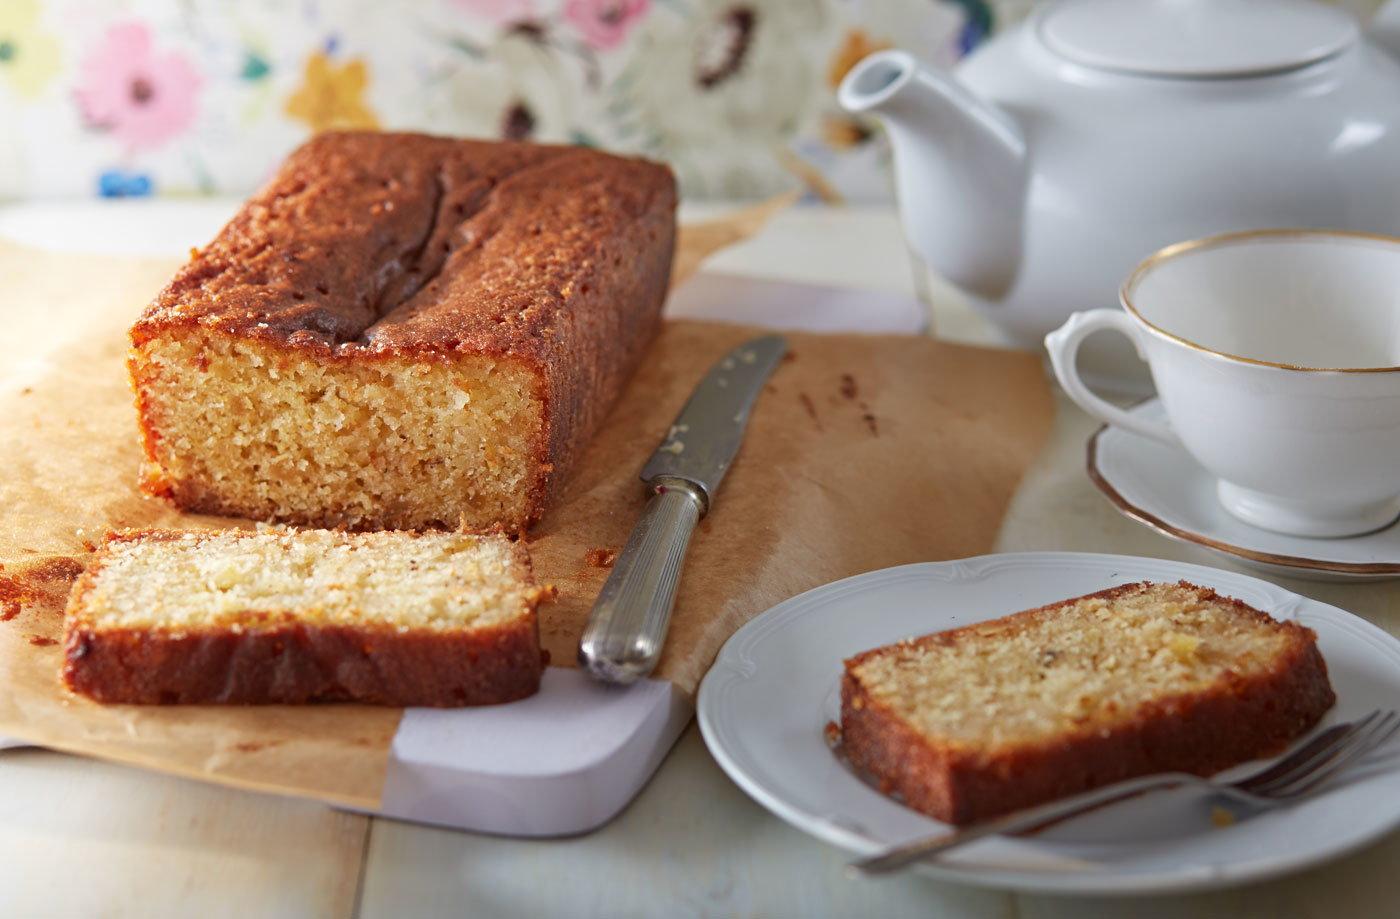 Lemon and Marzipan Drizzle Cake Recipe